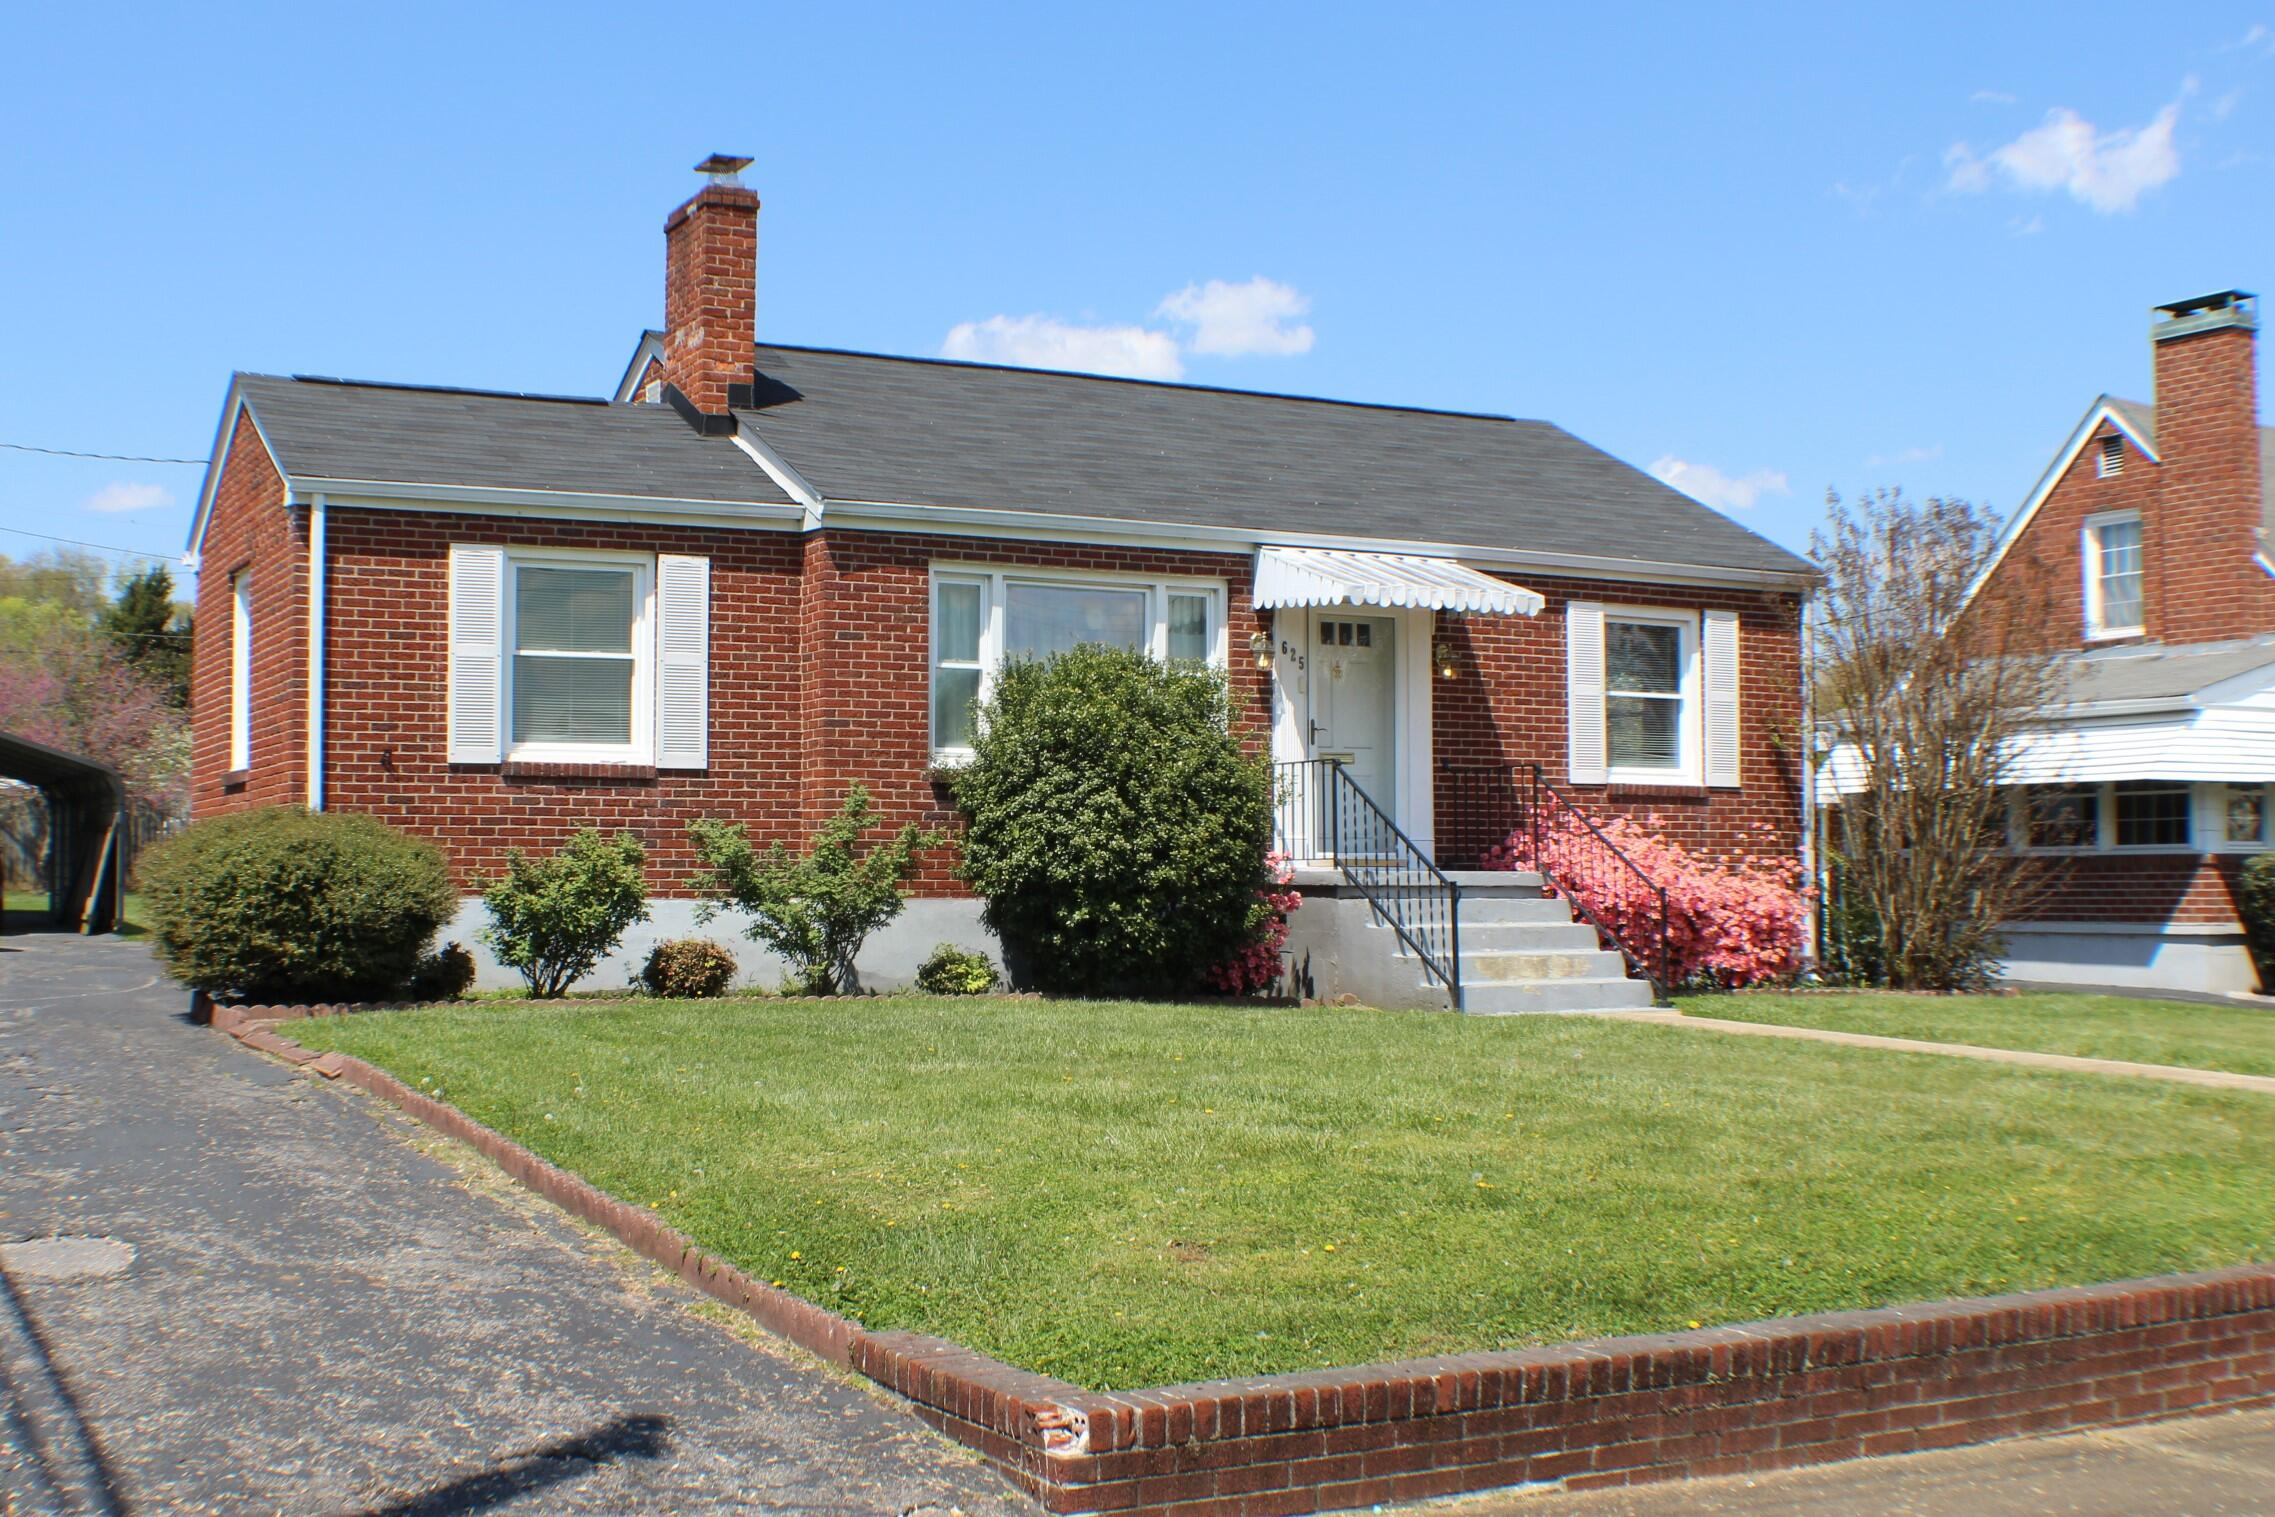 625 Morison Avenue, Kingsport, Tennessee 37660, 4 Bedrooms Bedrooms, ,2 BathroomsBathrooms,Single Family,For Sale,625 Morison Avenue,9921334